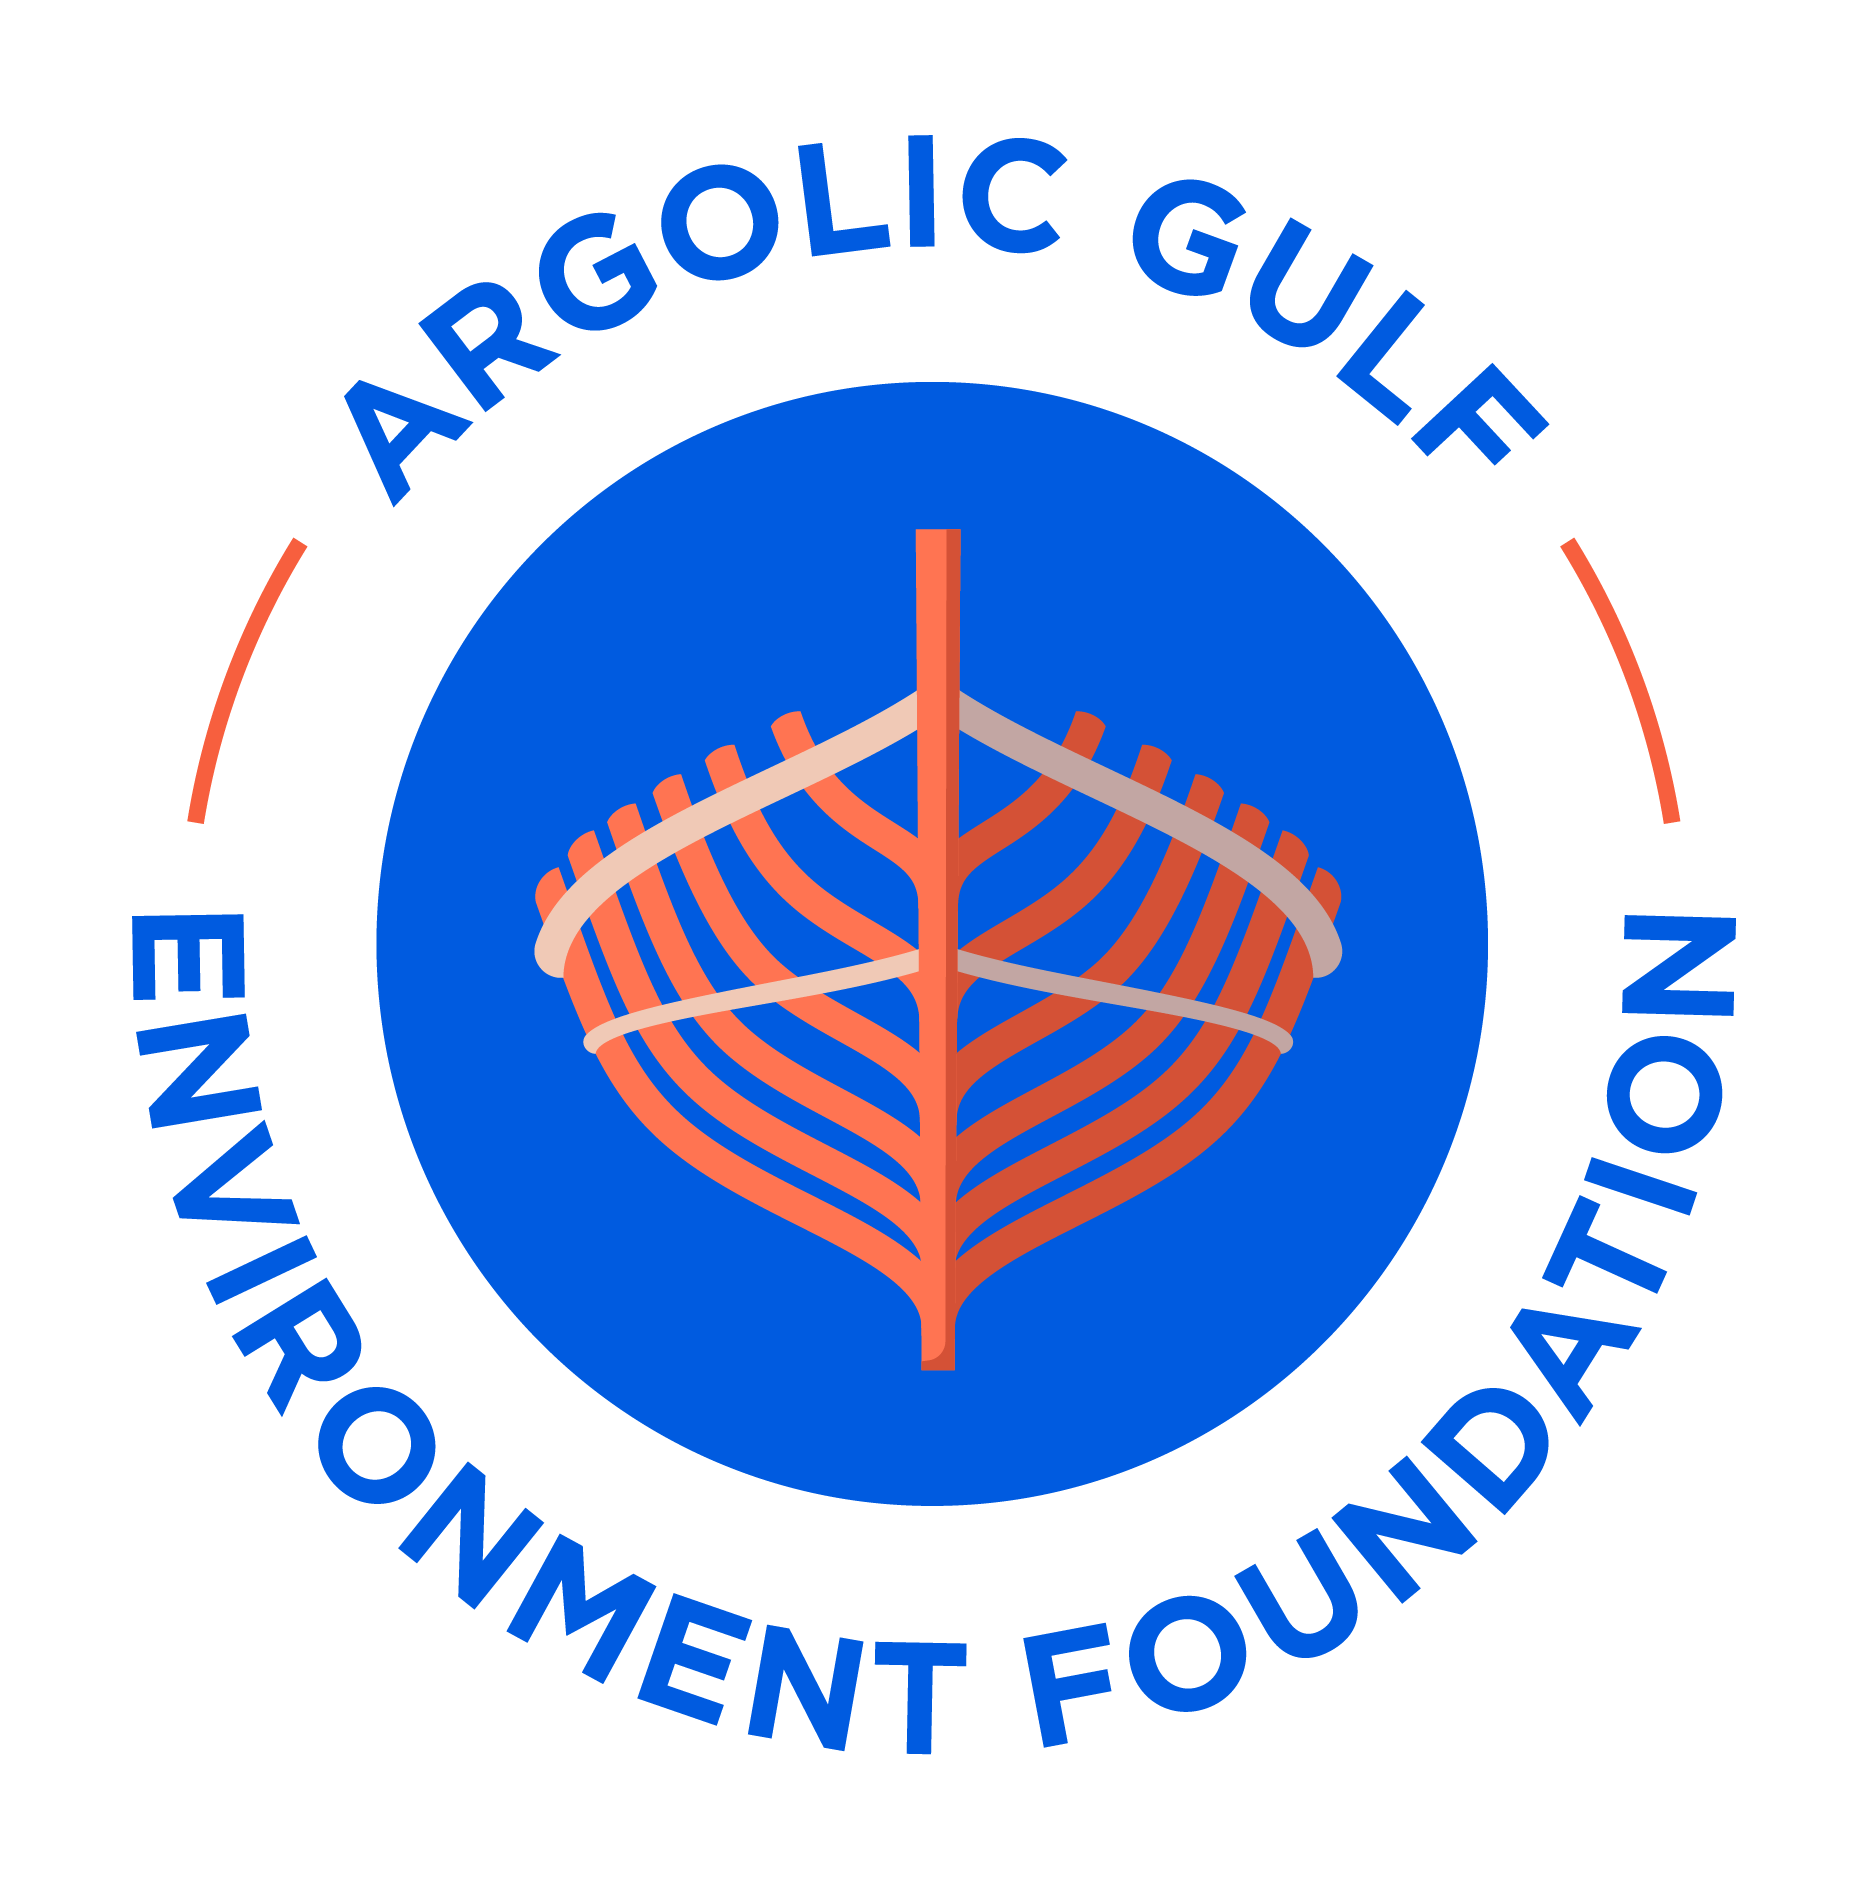 Argolic Gulf Environment Foundation